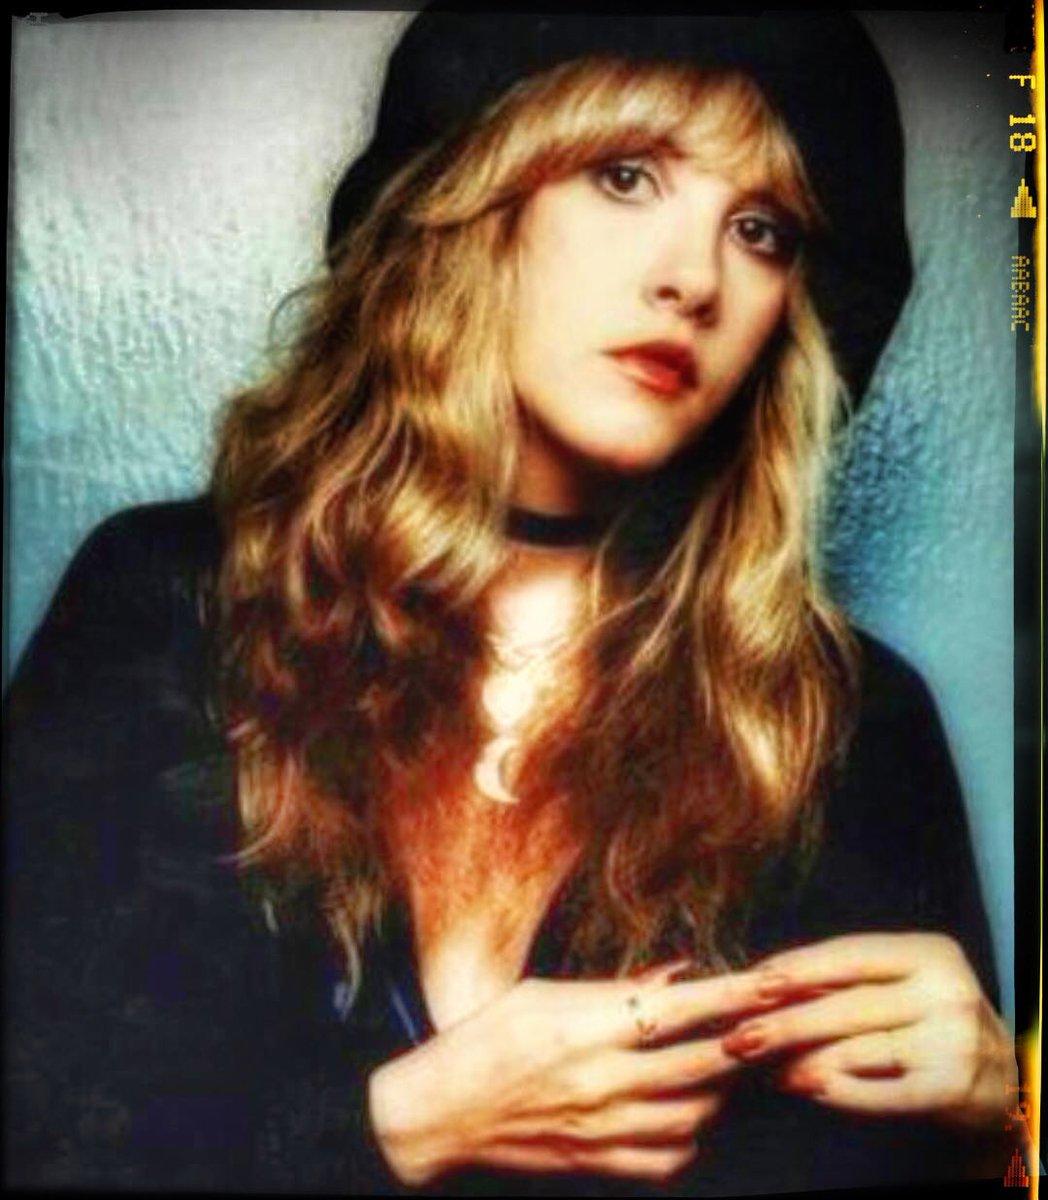 Gorgeous #StevieNicks #FleetwoodMac #beautiful #vintage #70s #80s #follow #ChristineMcVie #Rumours #Tusk #Mirage #WildHeart #BellaDonna